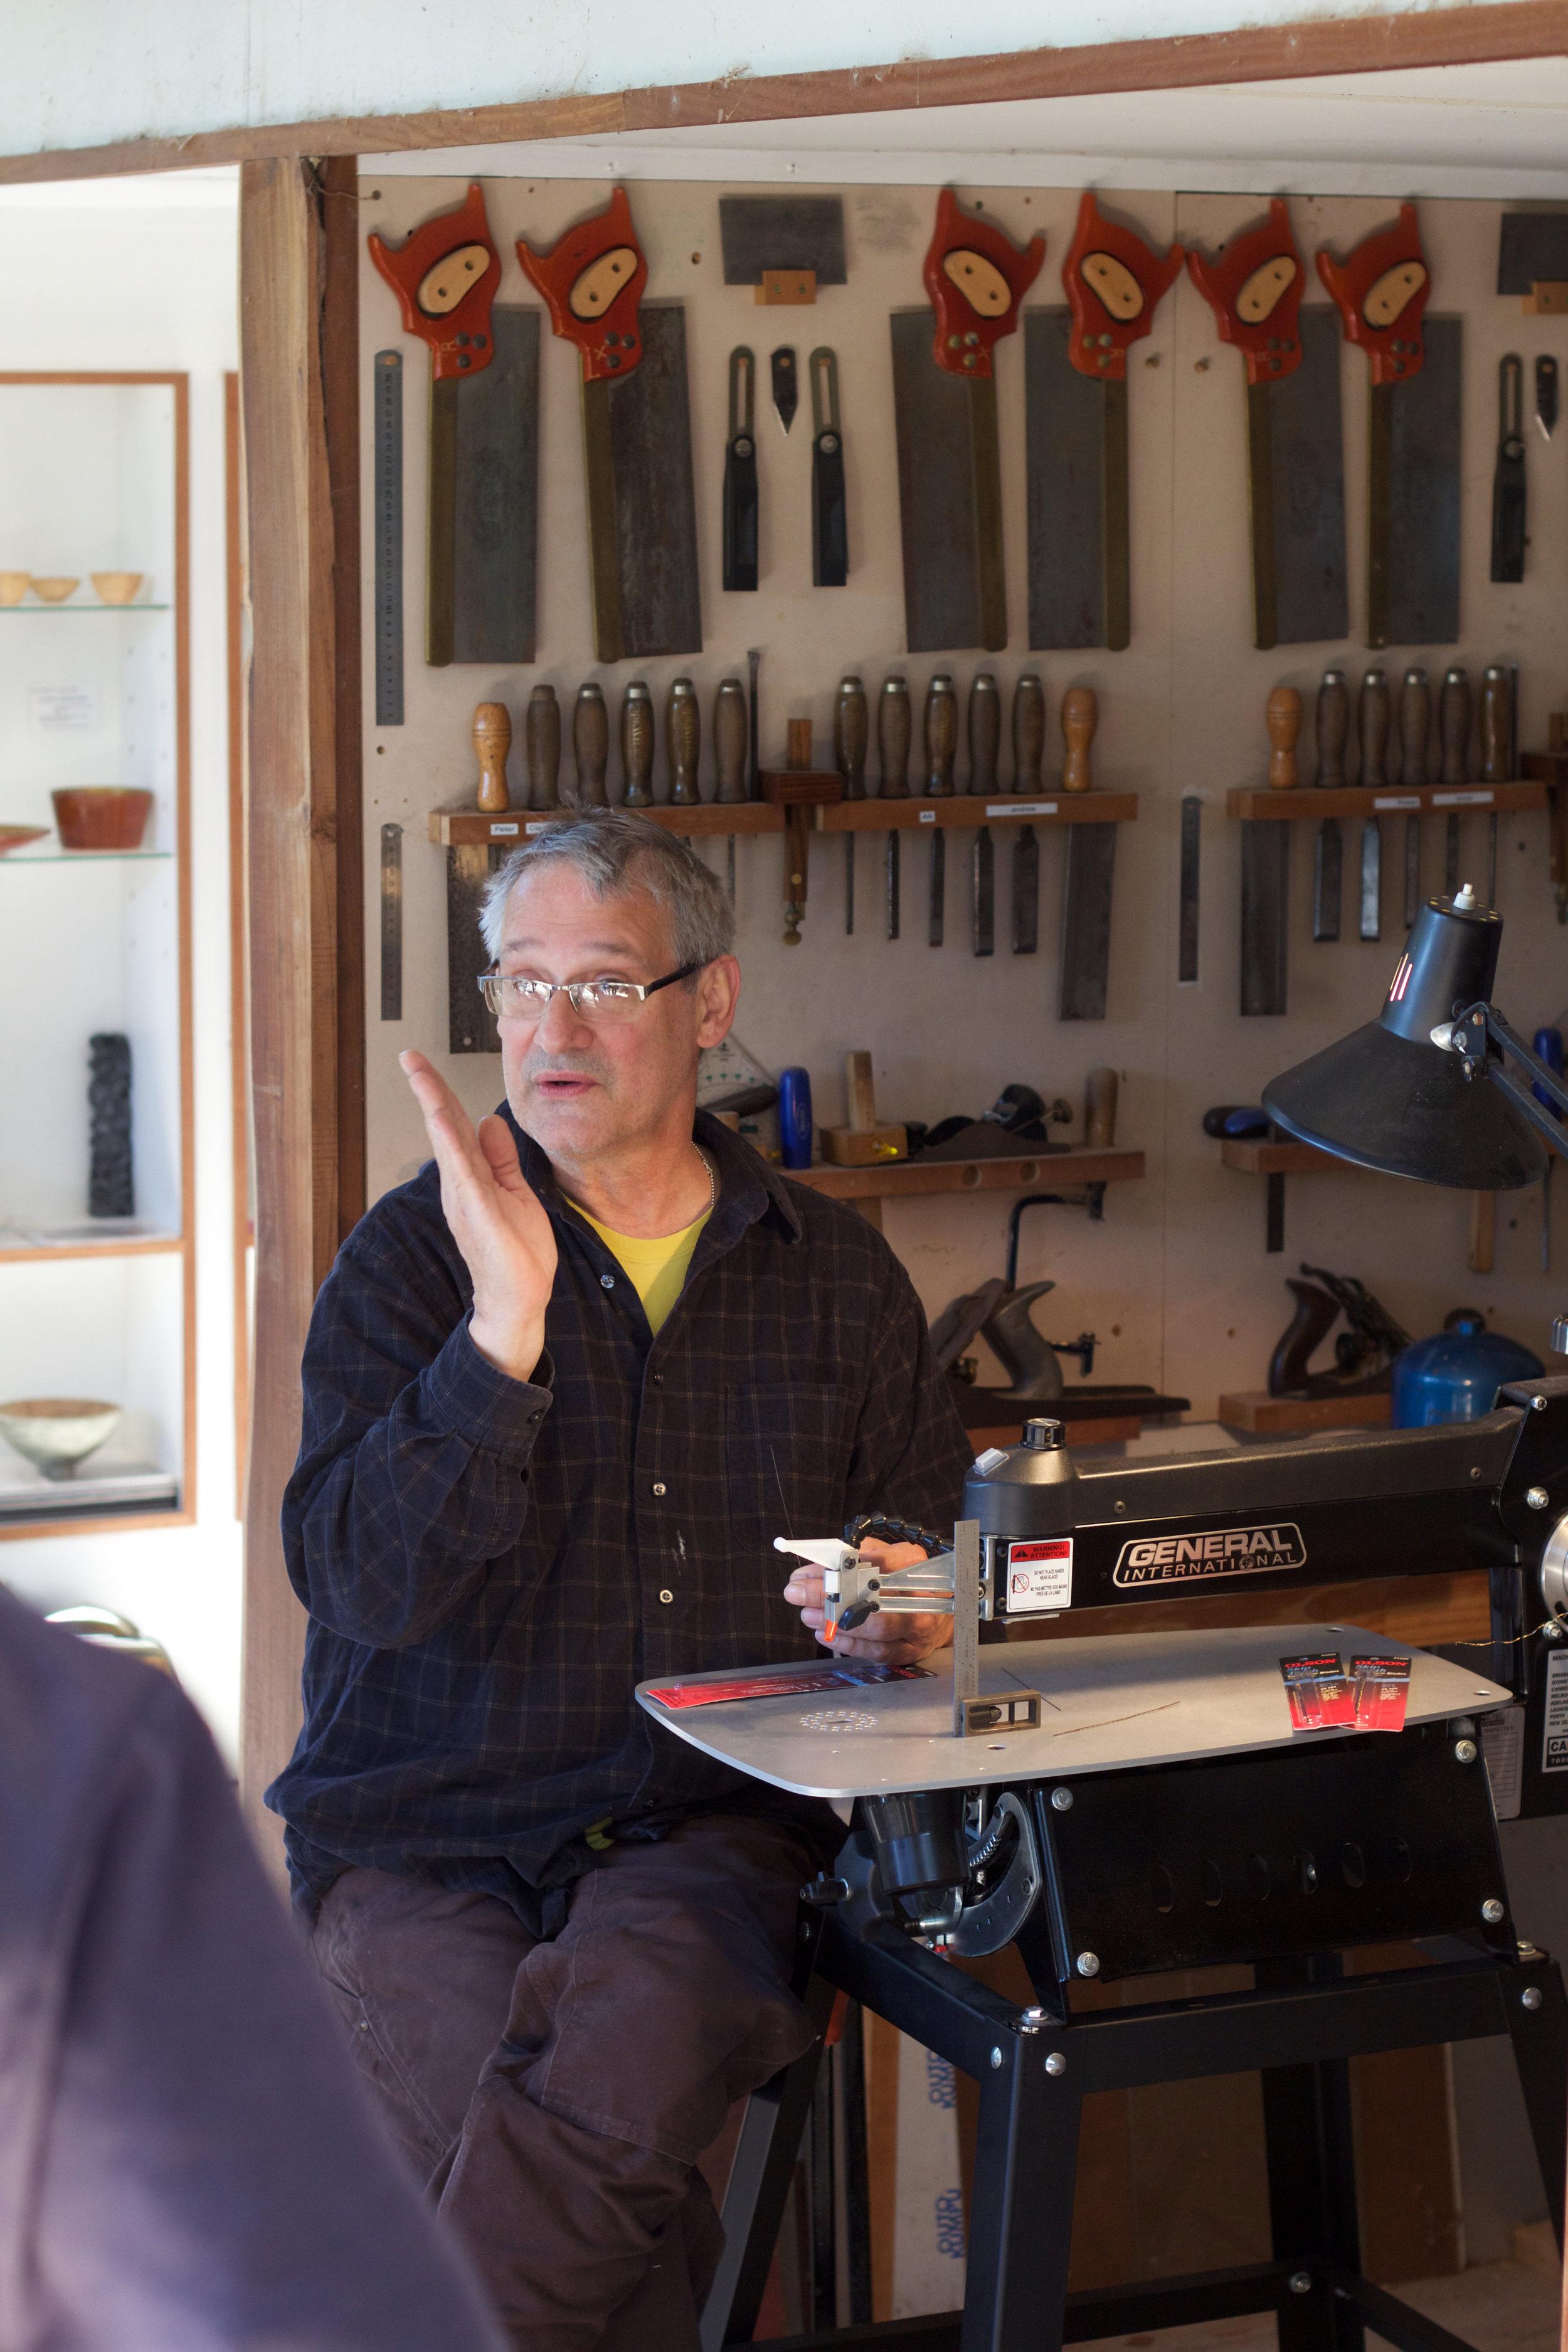 Brian Reid leading a woodworking class in the Cooroora Institute teaching studio